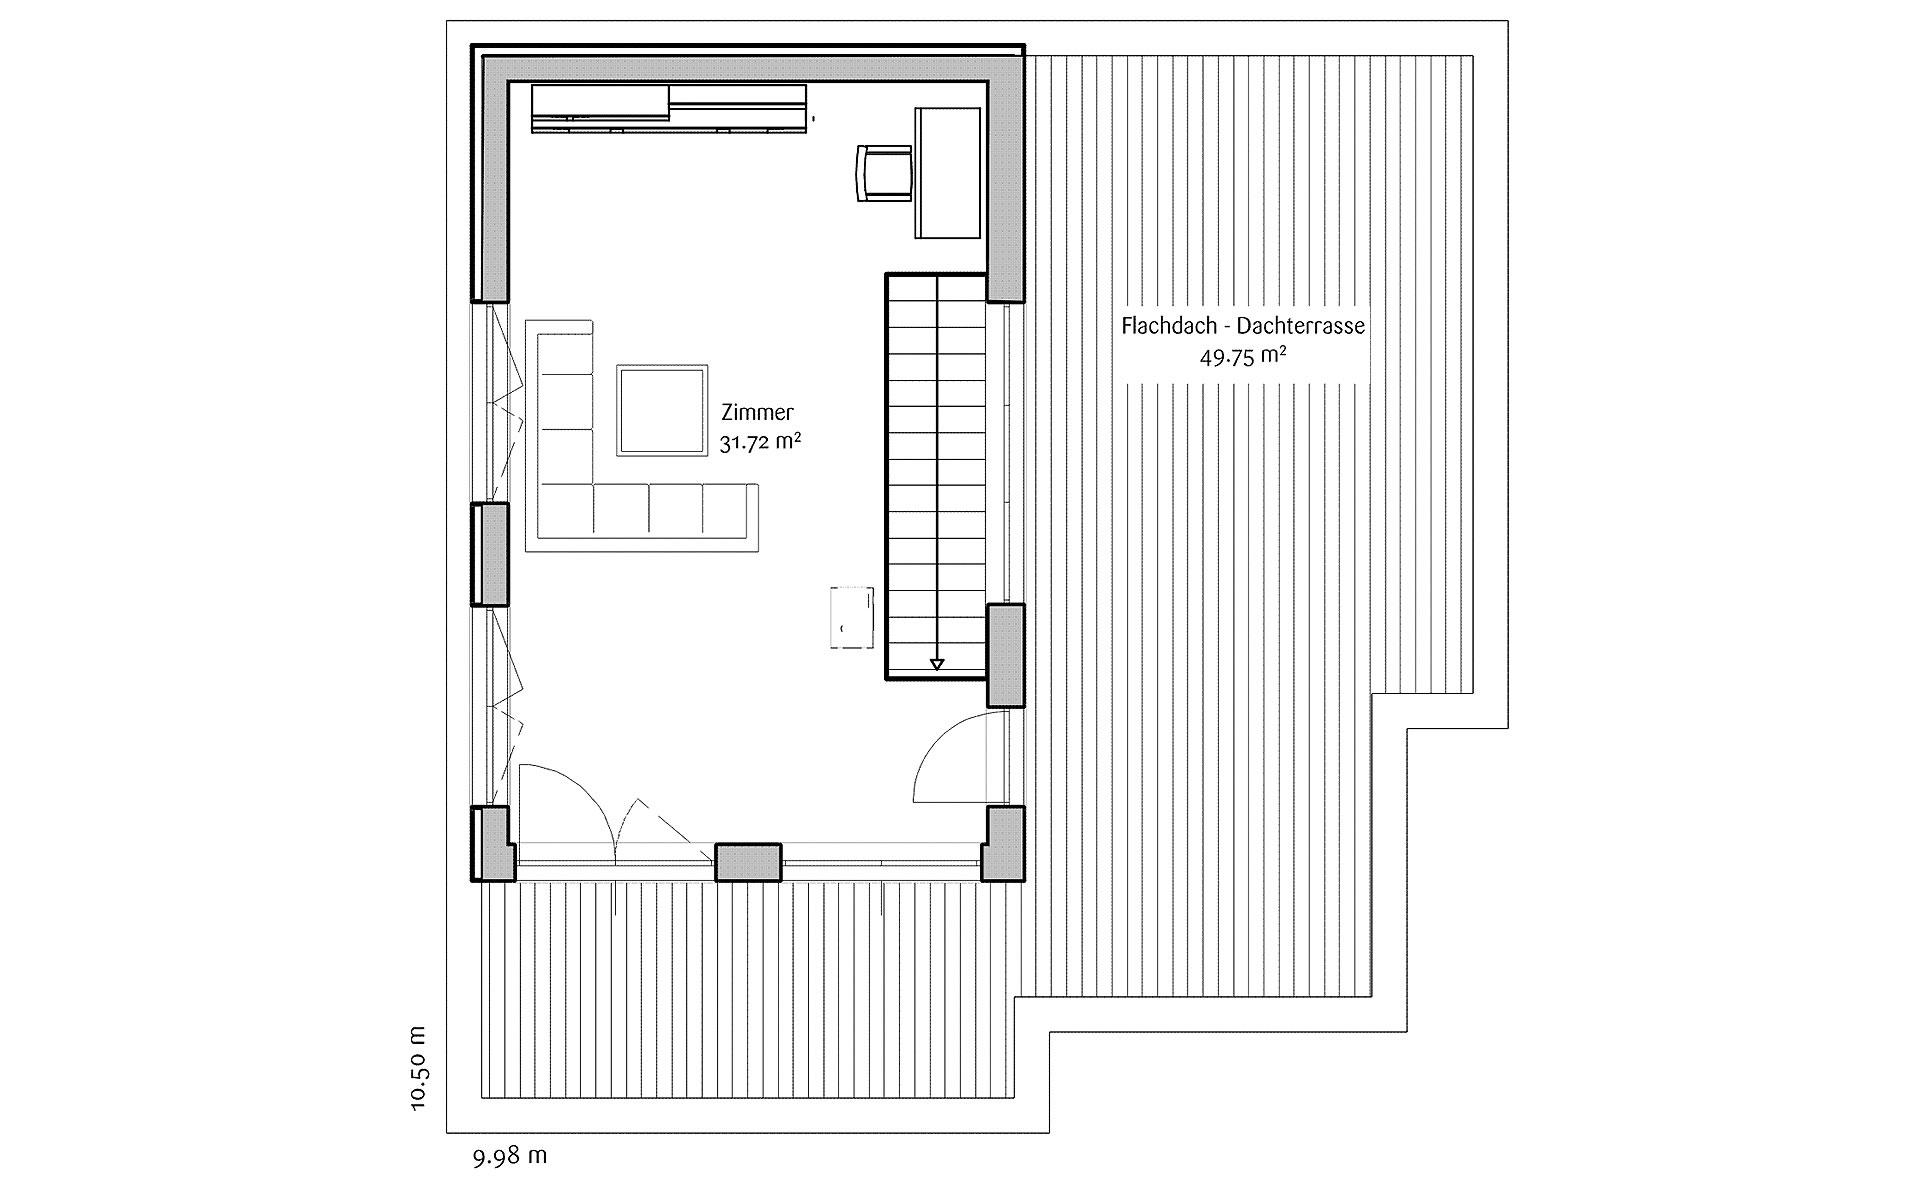 Dachgeschoss LaStructura Orchis von FischerHaus GmbH & Co. KG